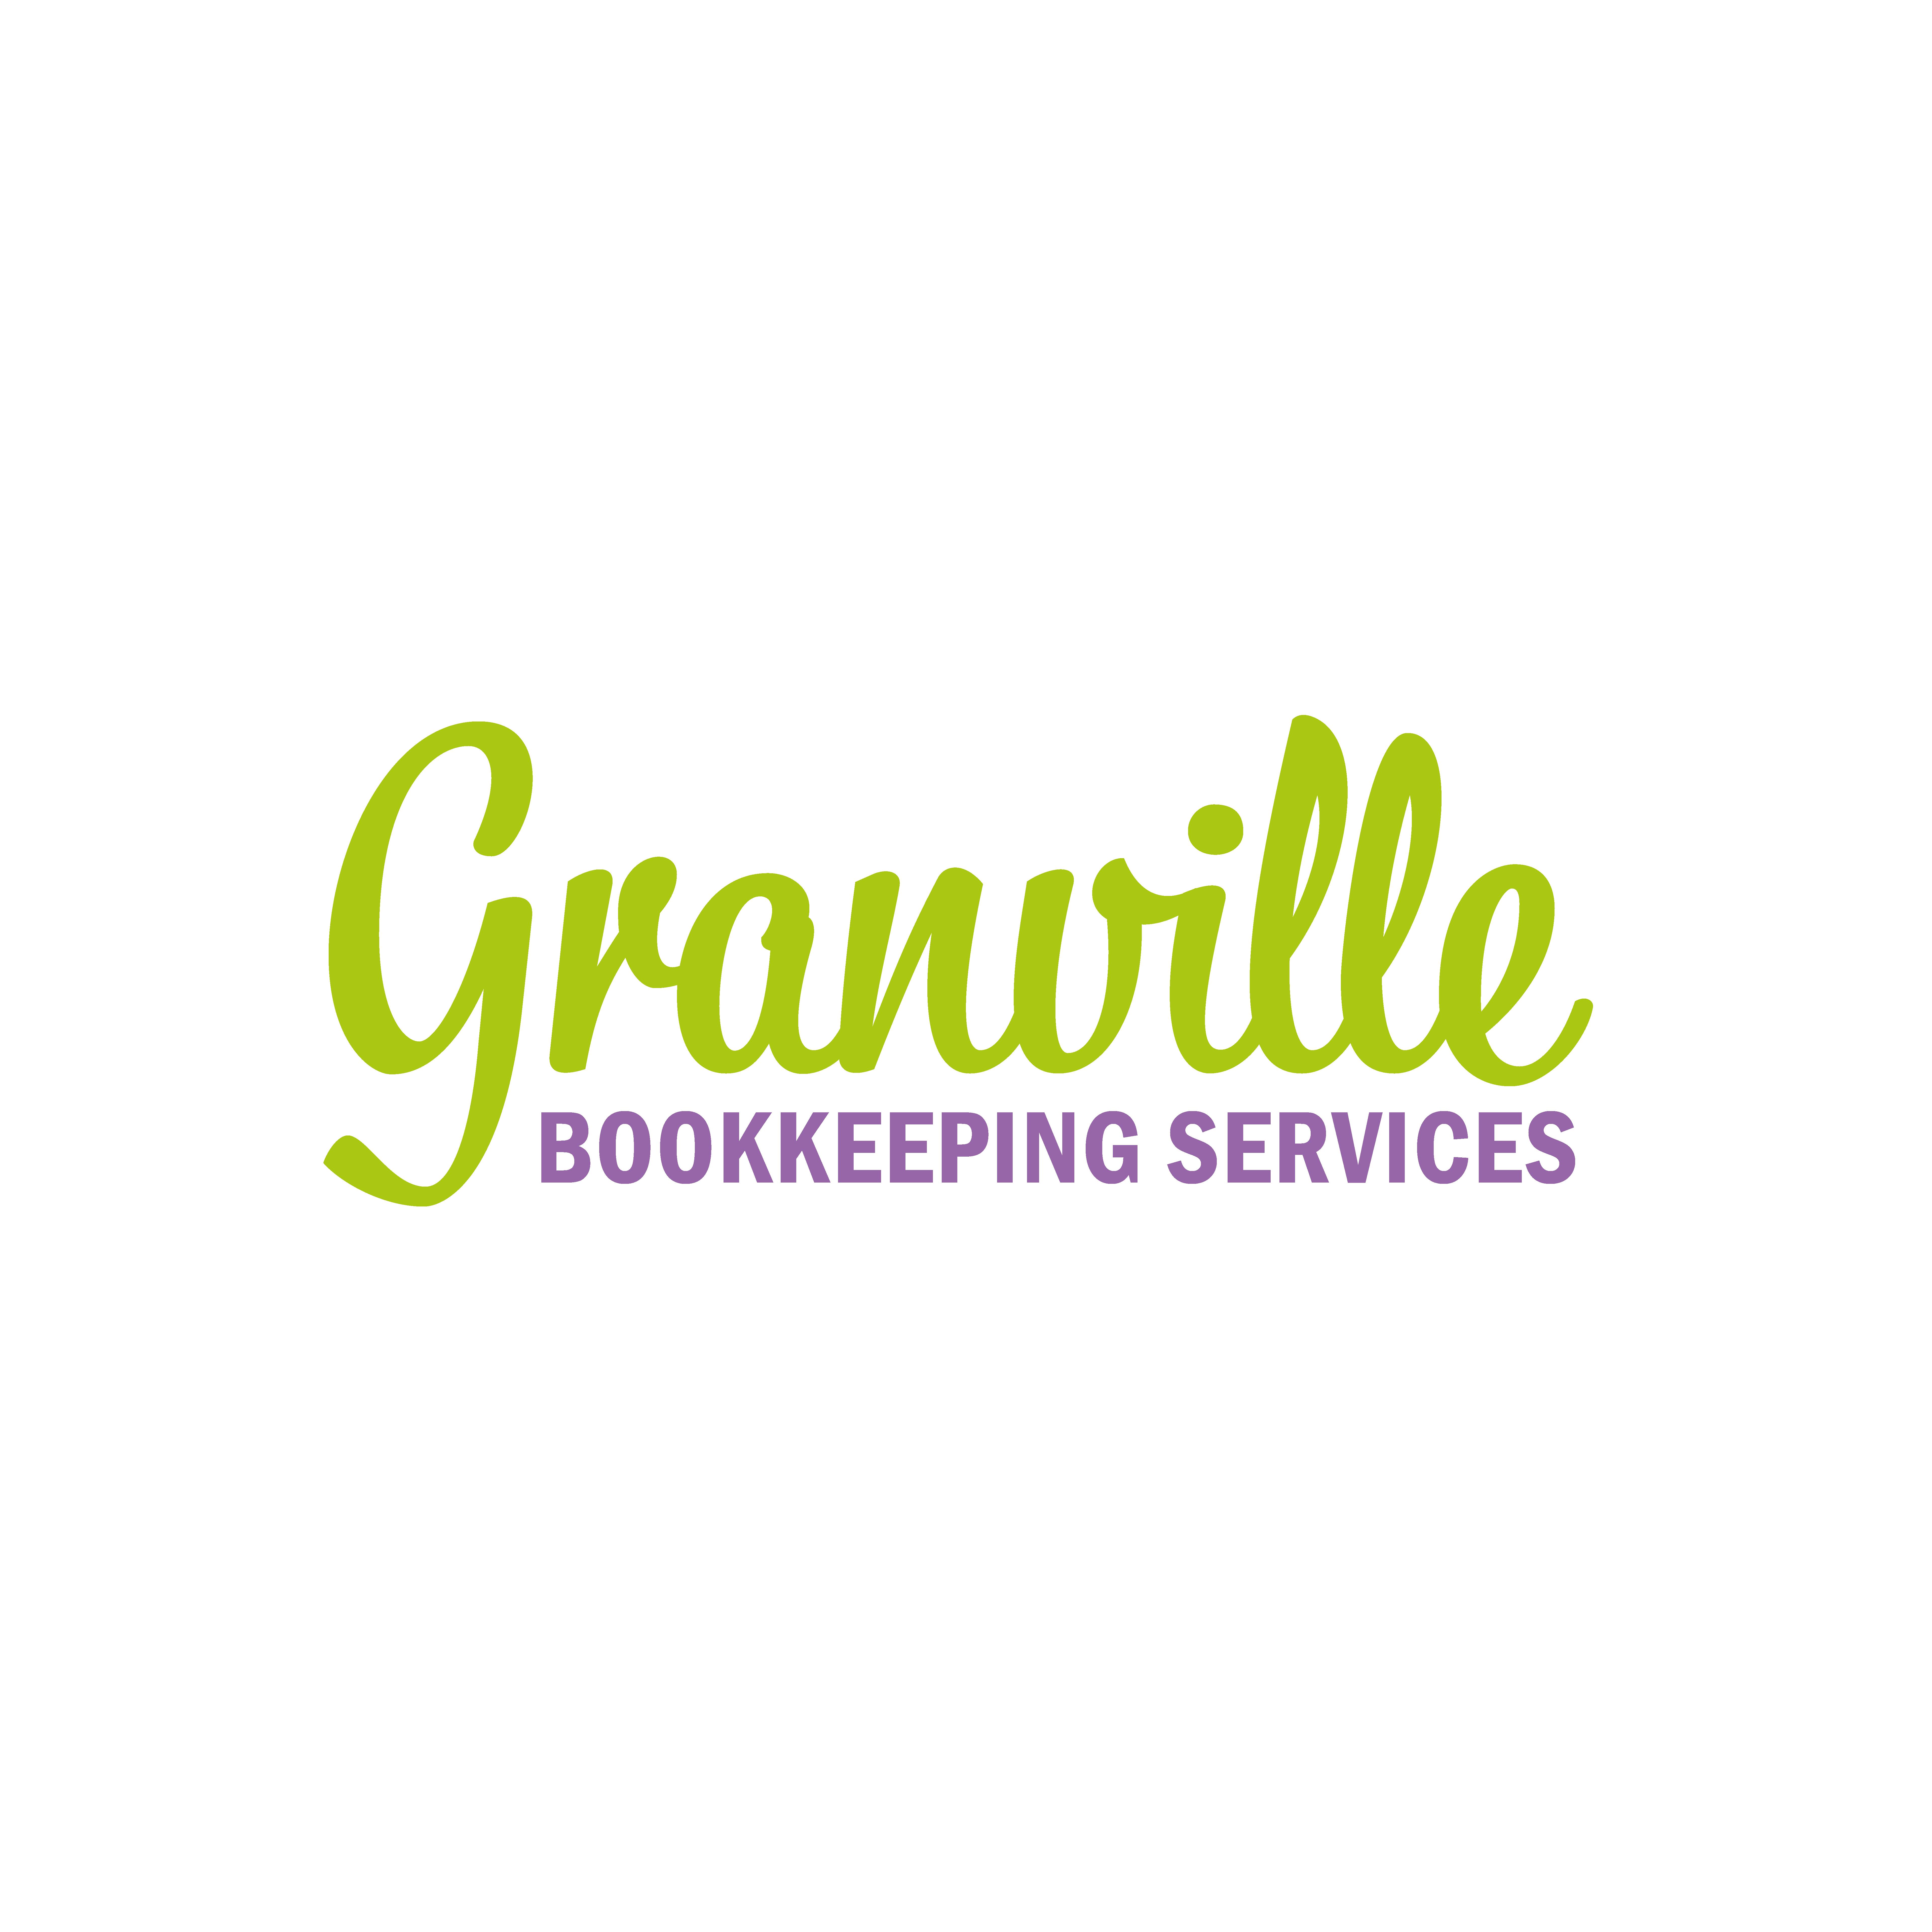 Granville Bookkeeping Services Logo